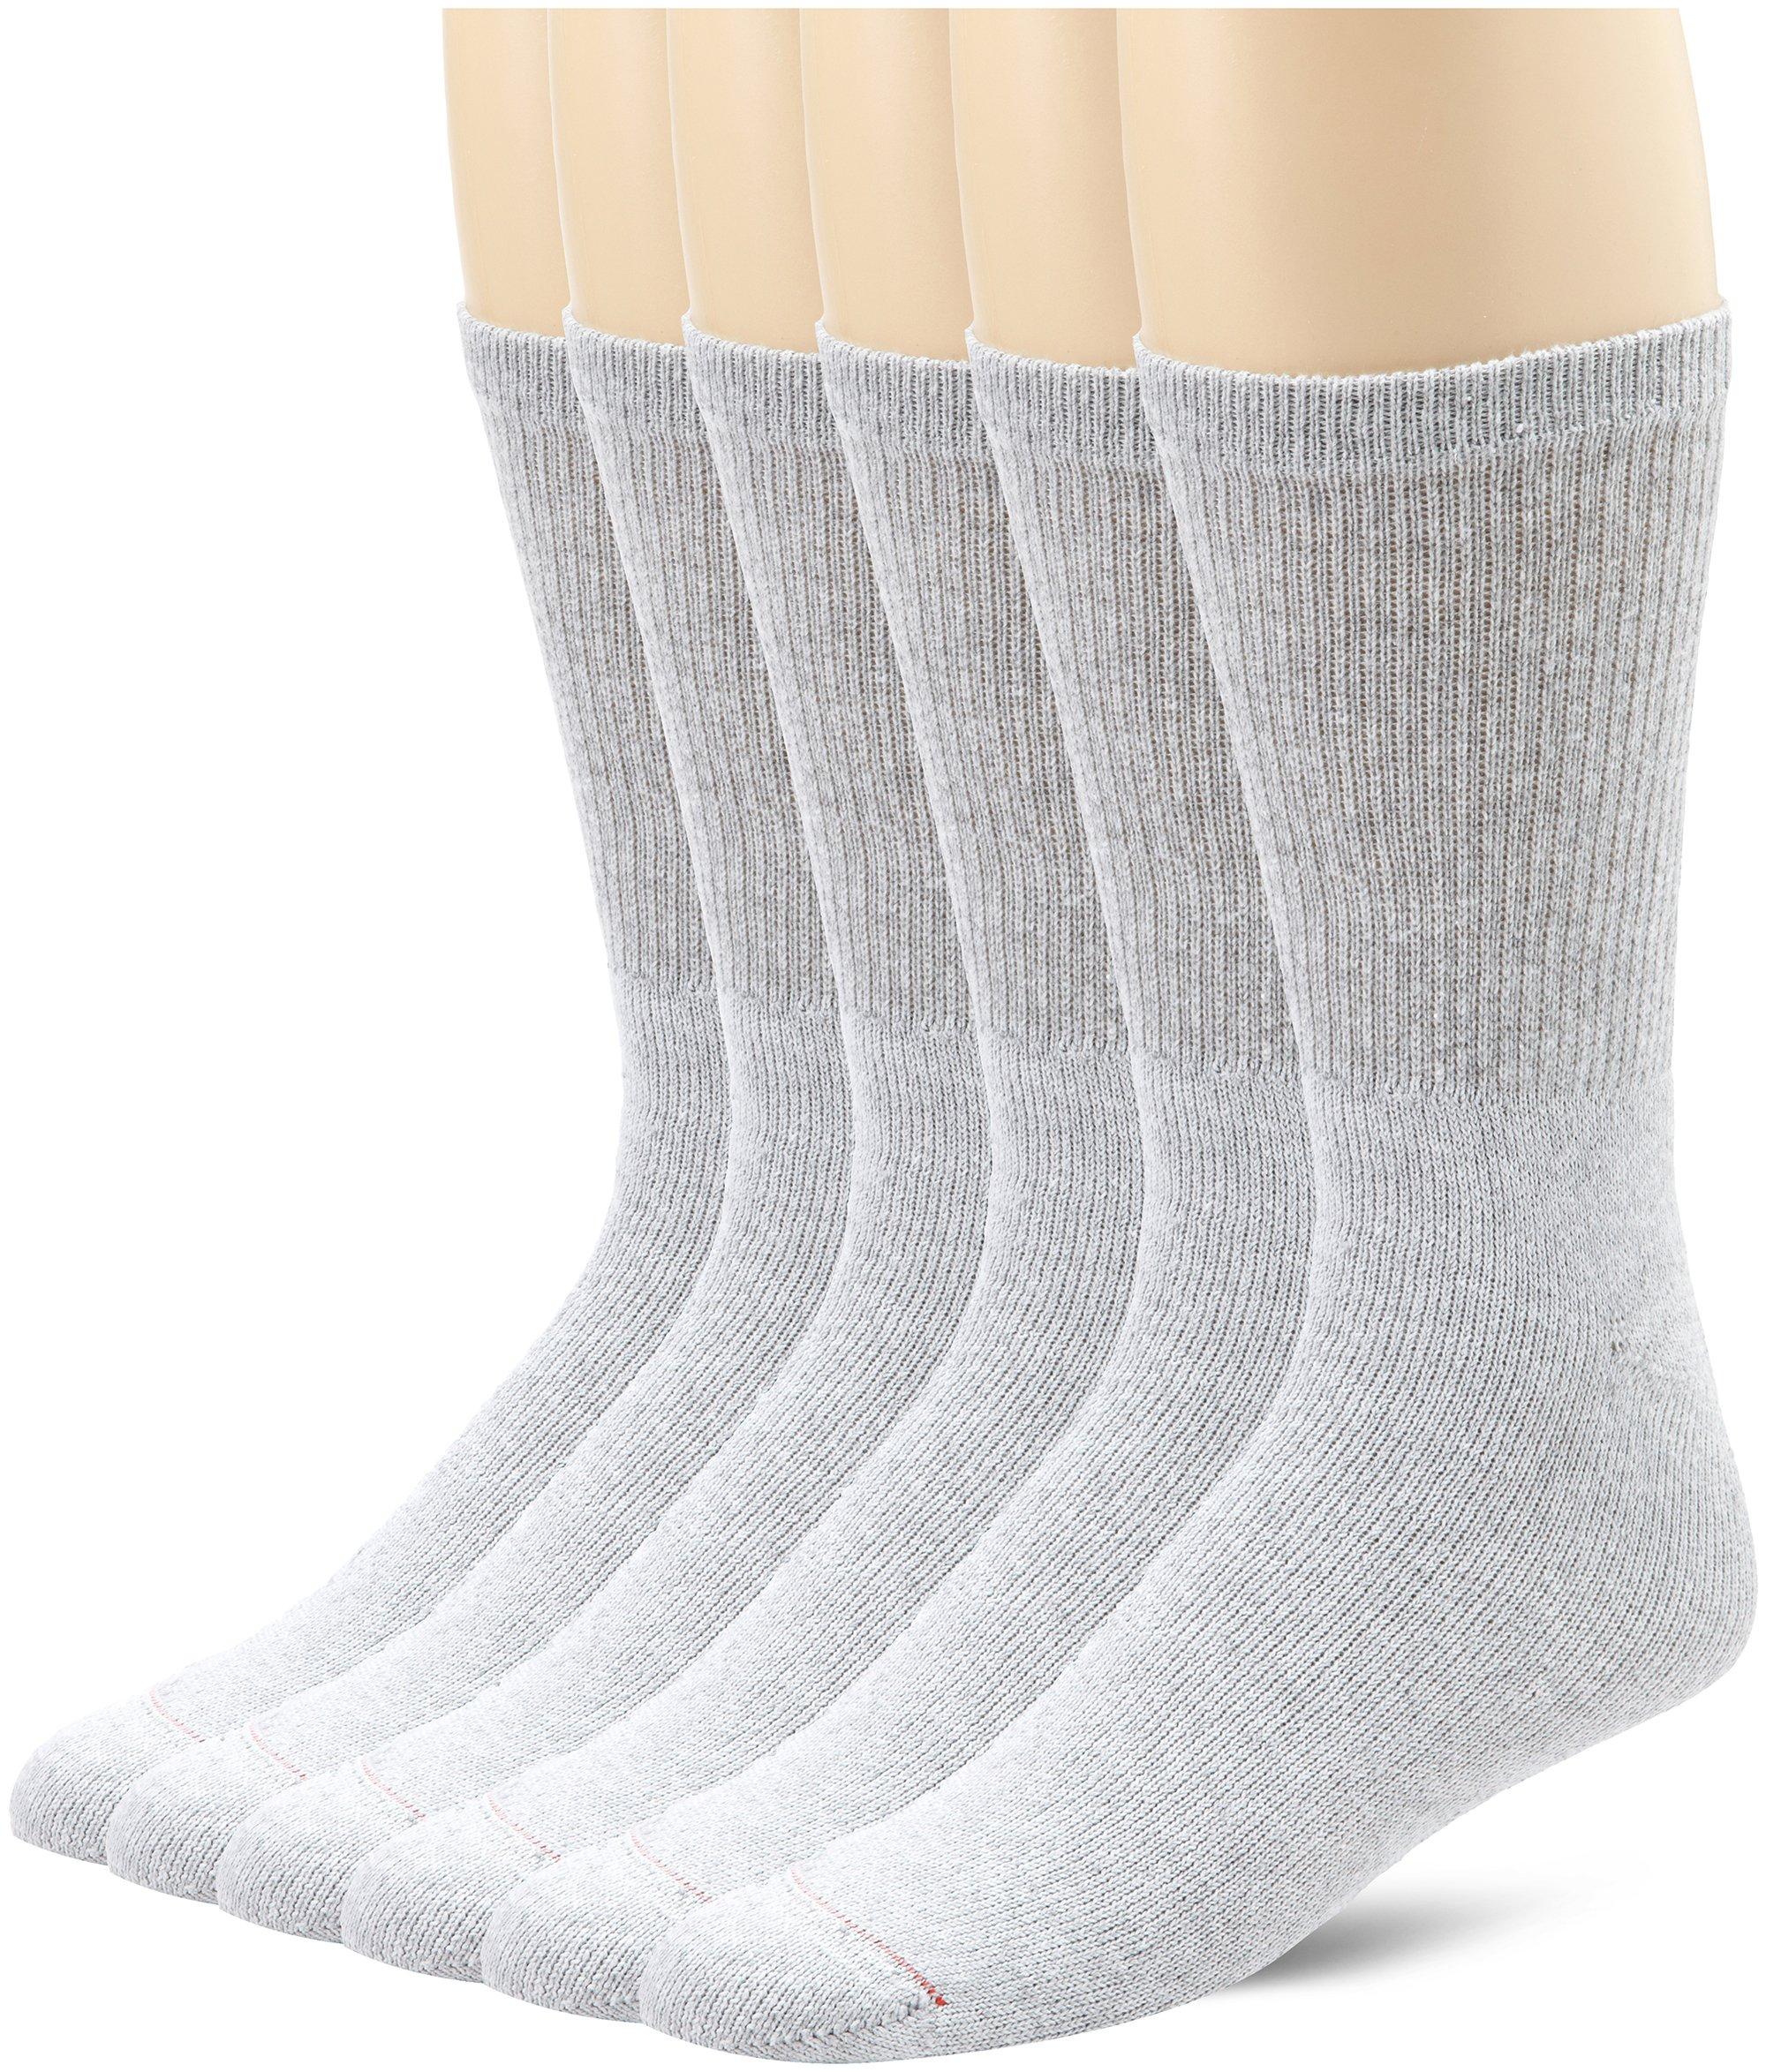 Hanes Active Crew Socks, 6 pack (Sock 10-13/Shoe 6-12/Grey)